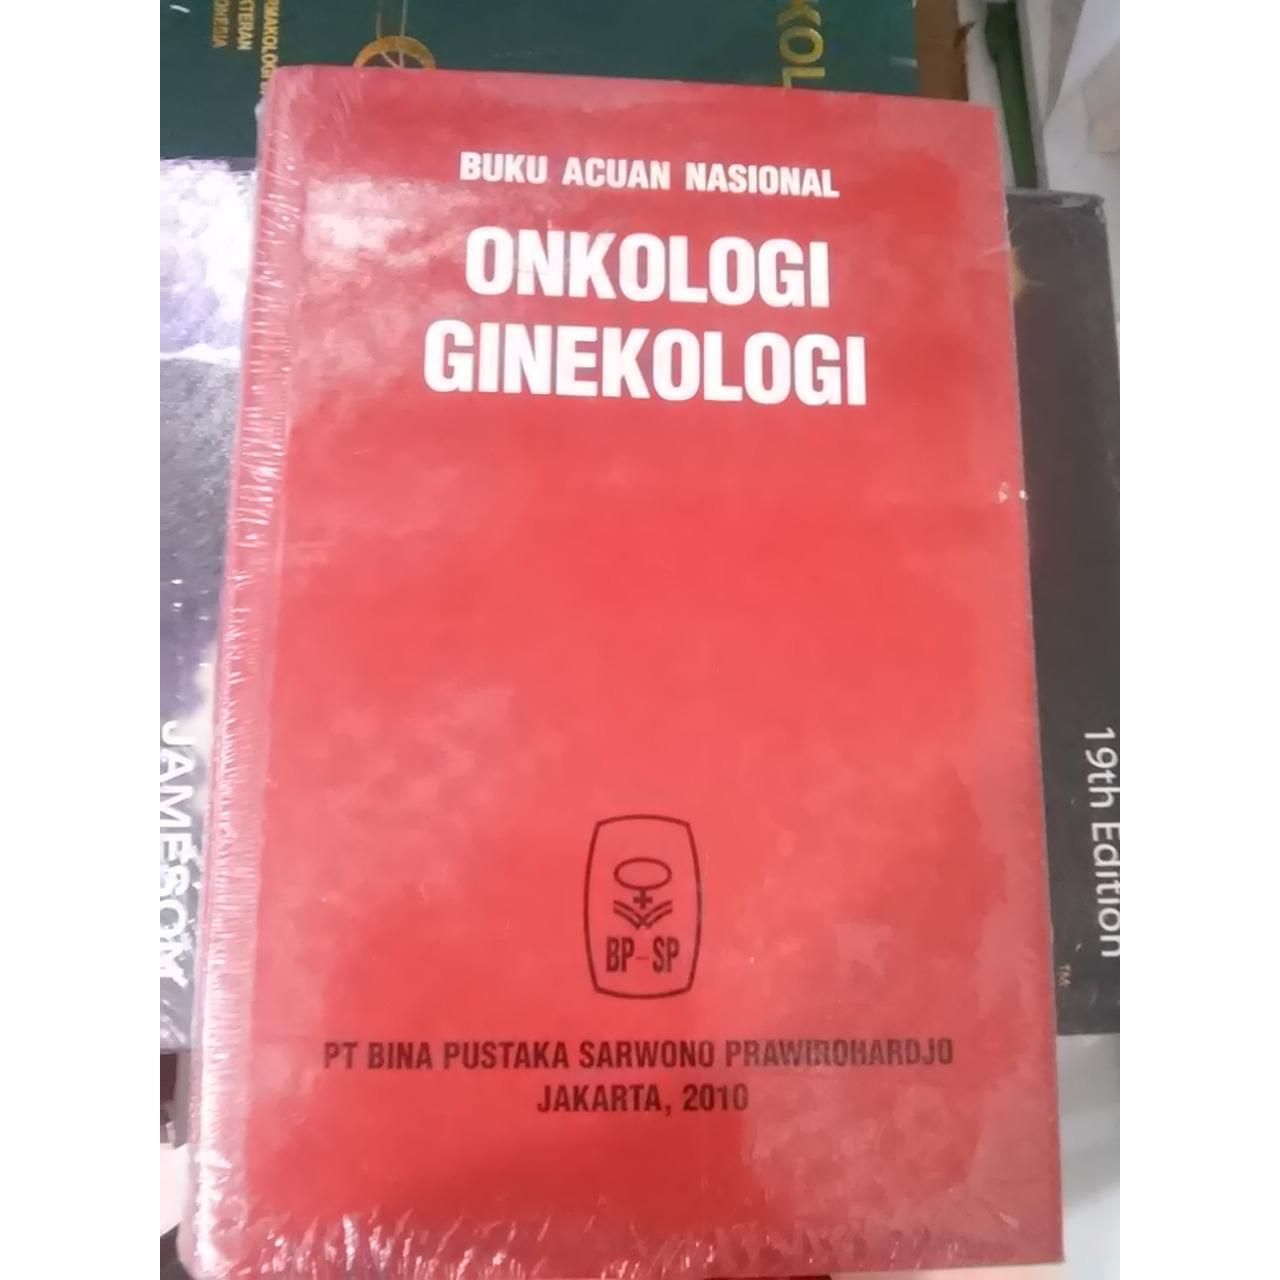 Buku Acuan Nasional Onkologi dan Ginekologi - Sarwono Prawirahardjo